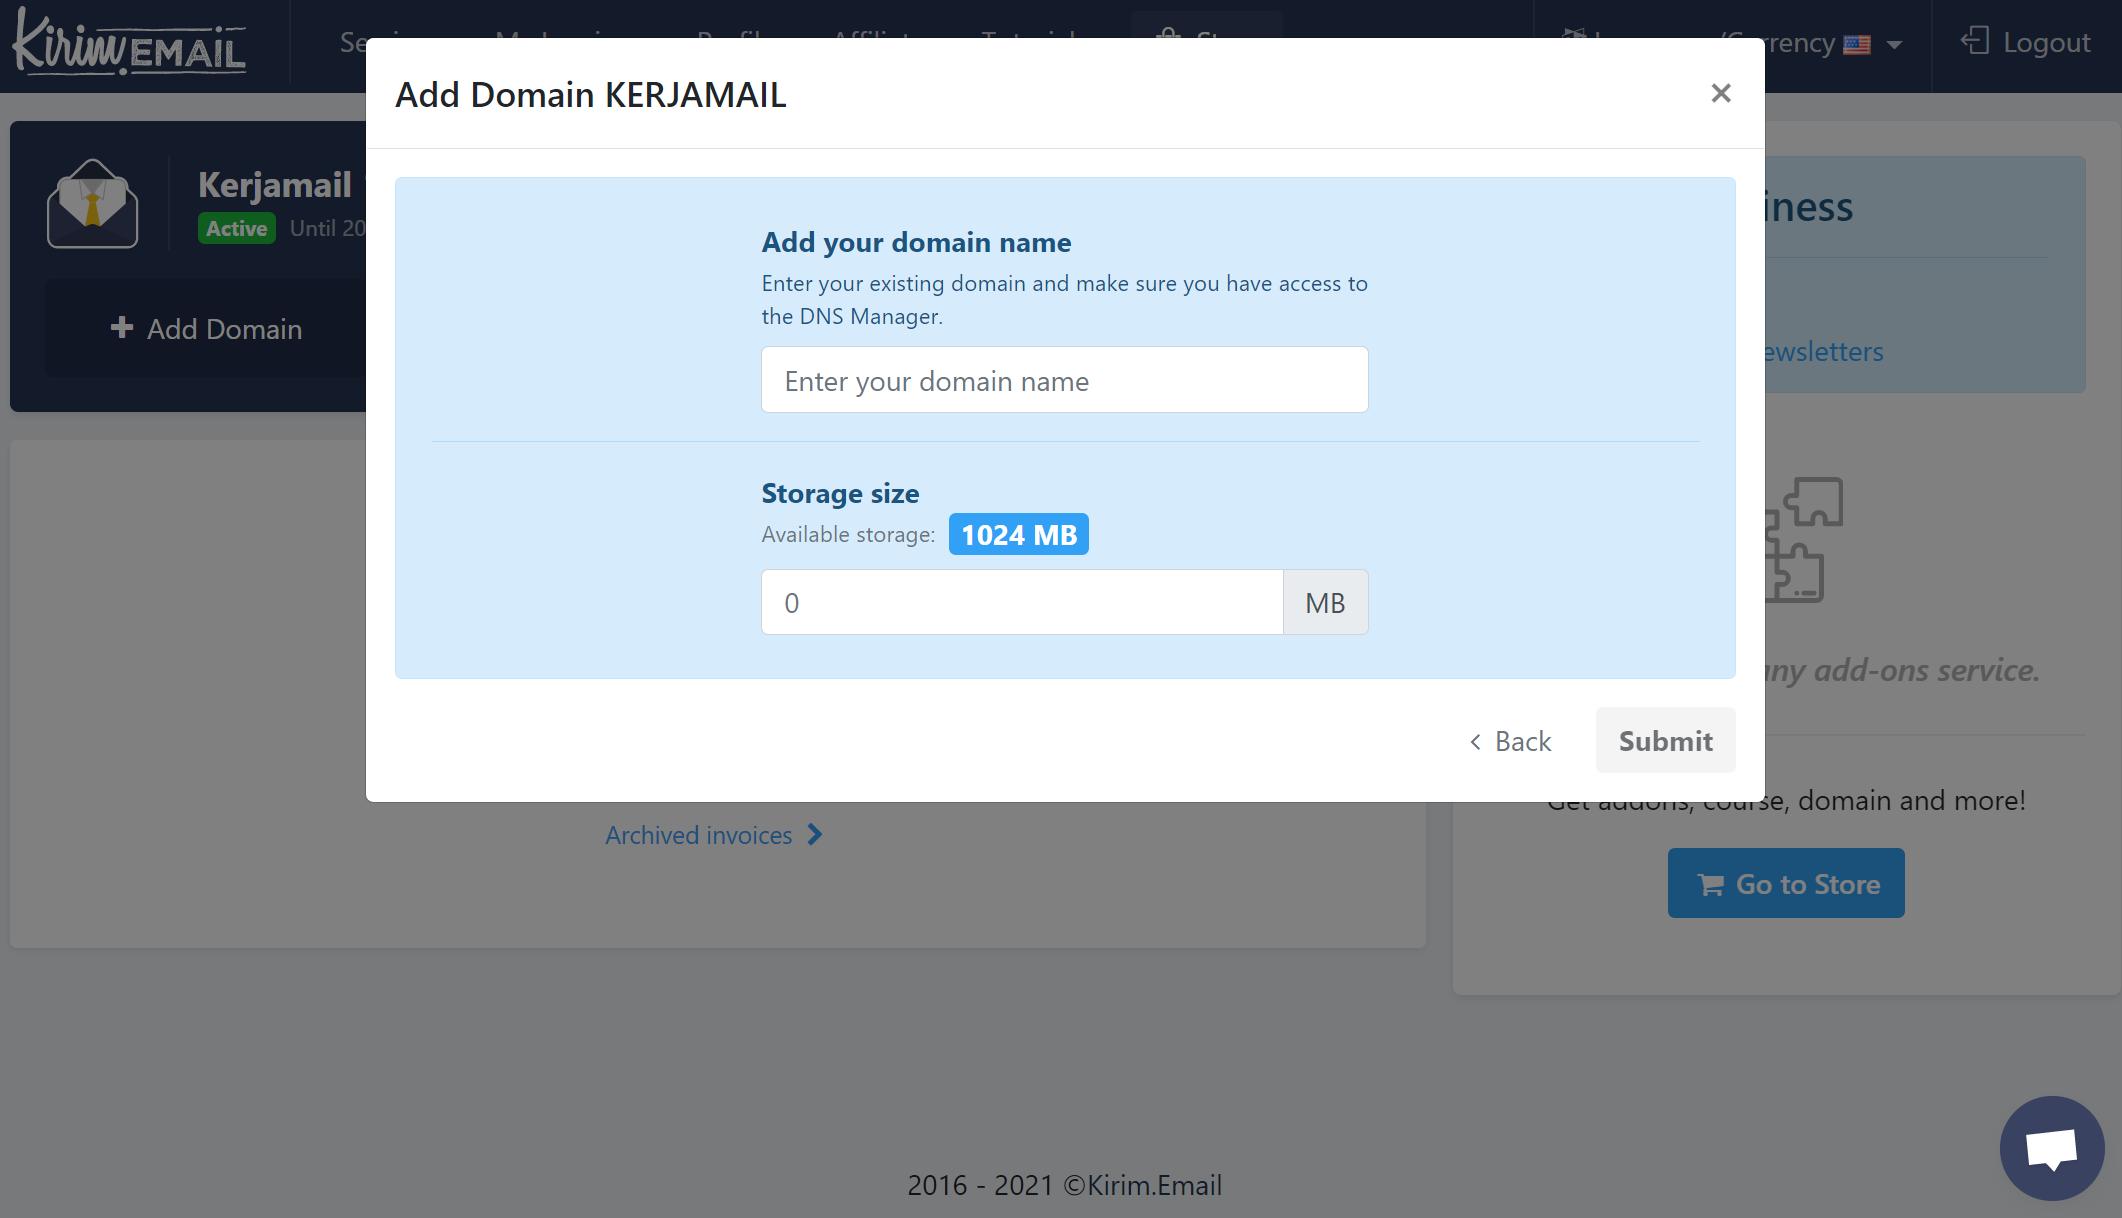 Kerjamail - Adding New Domain